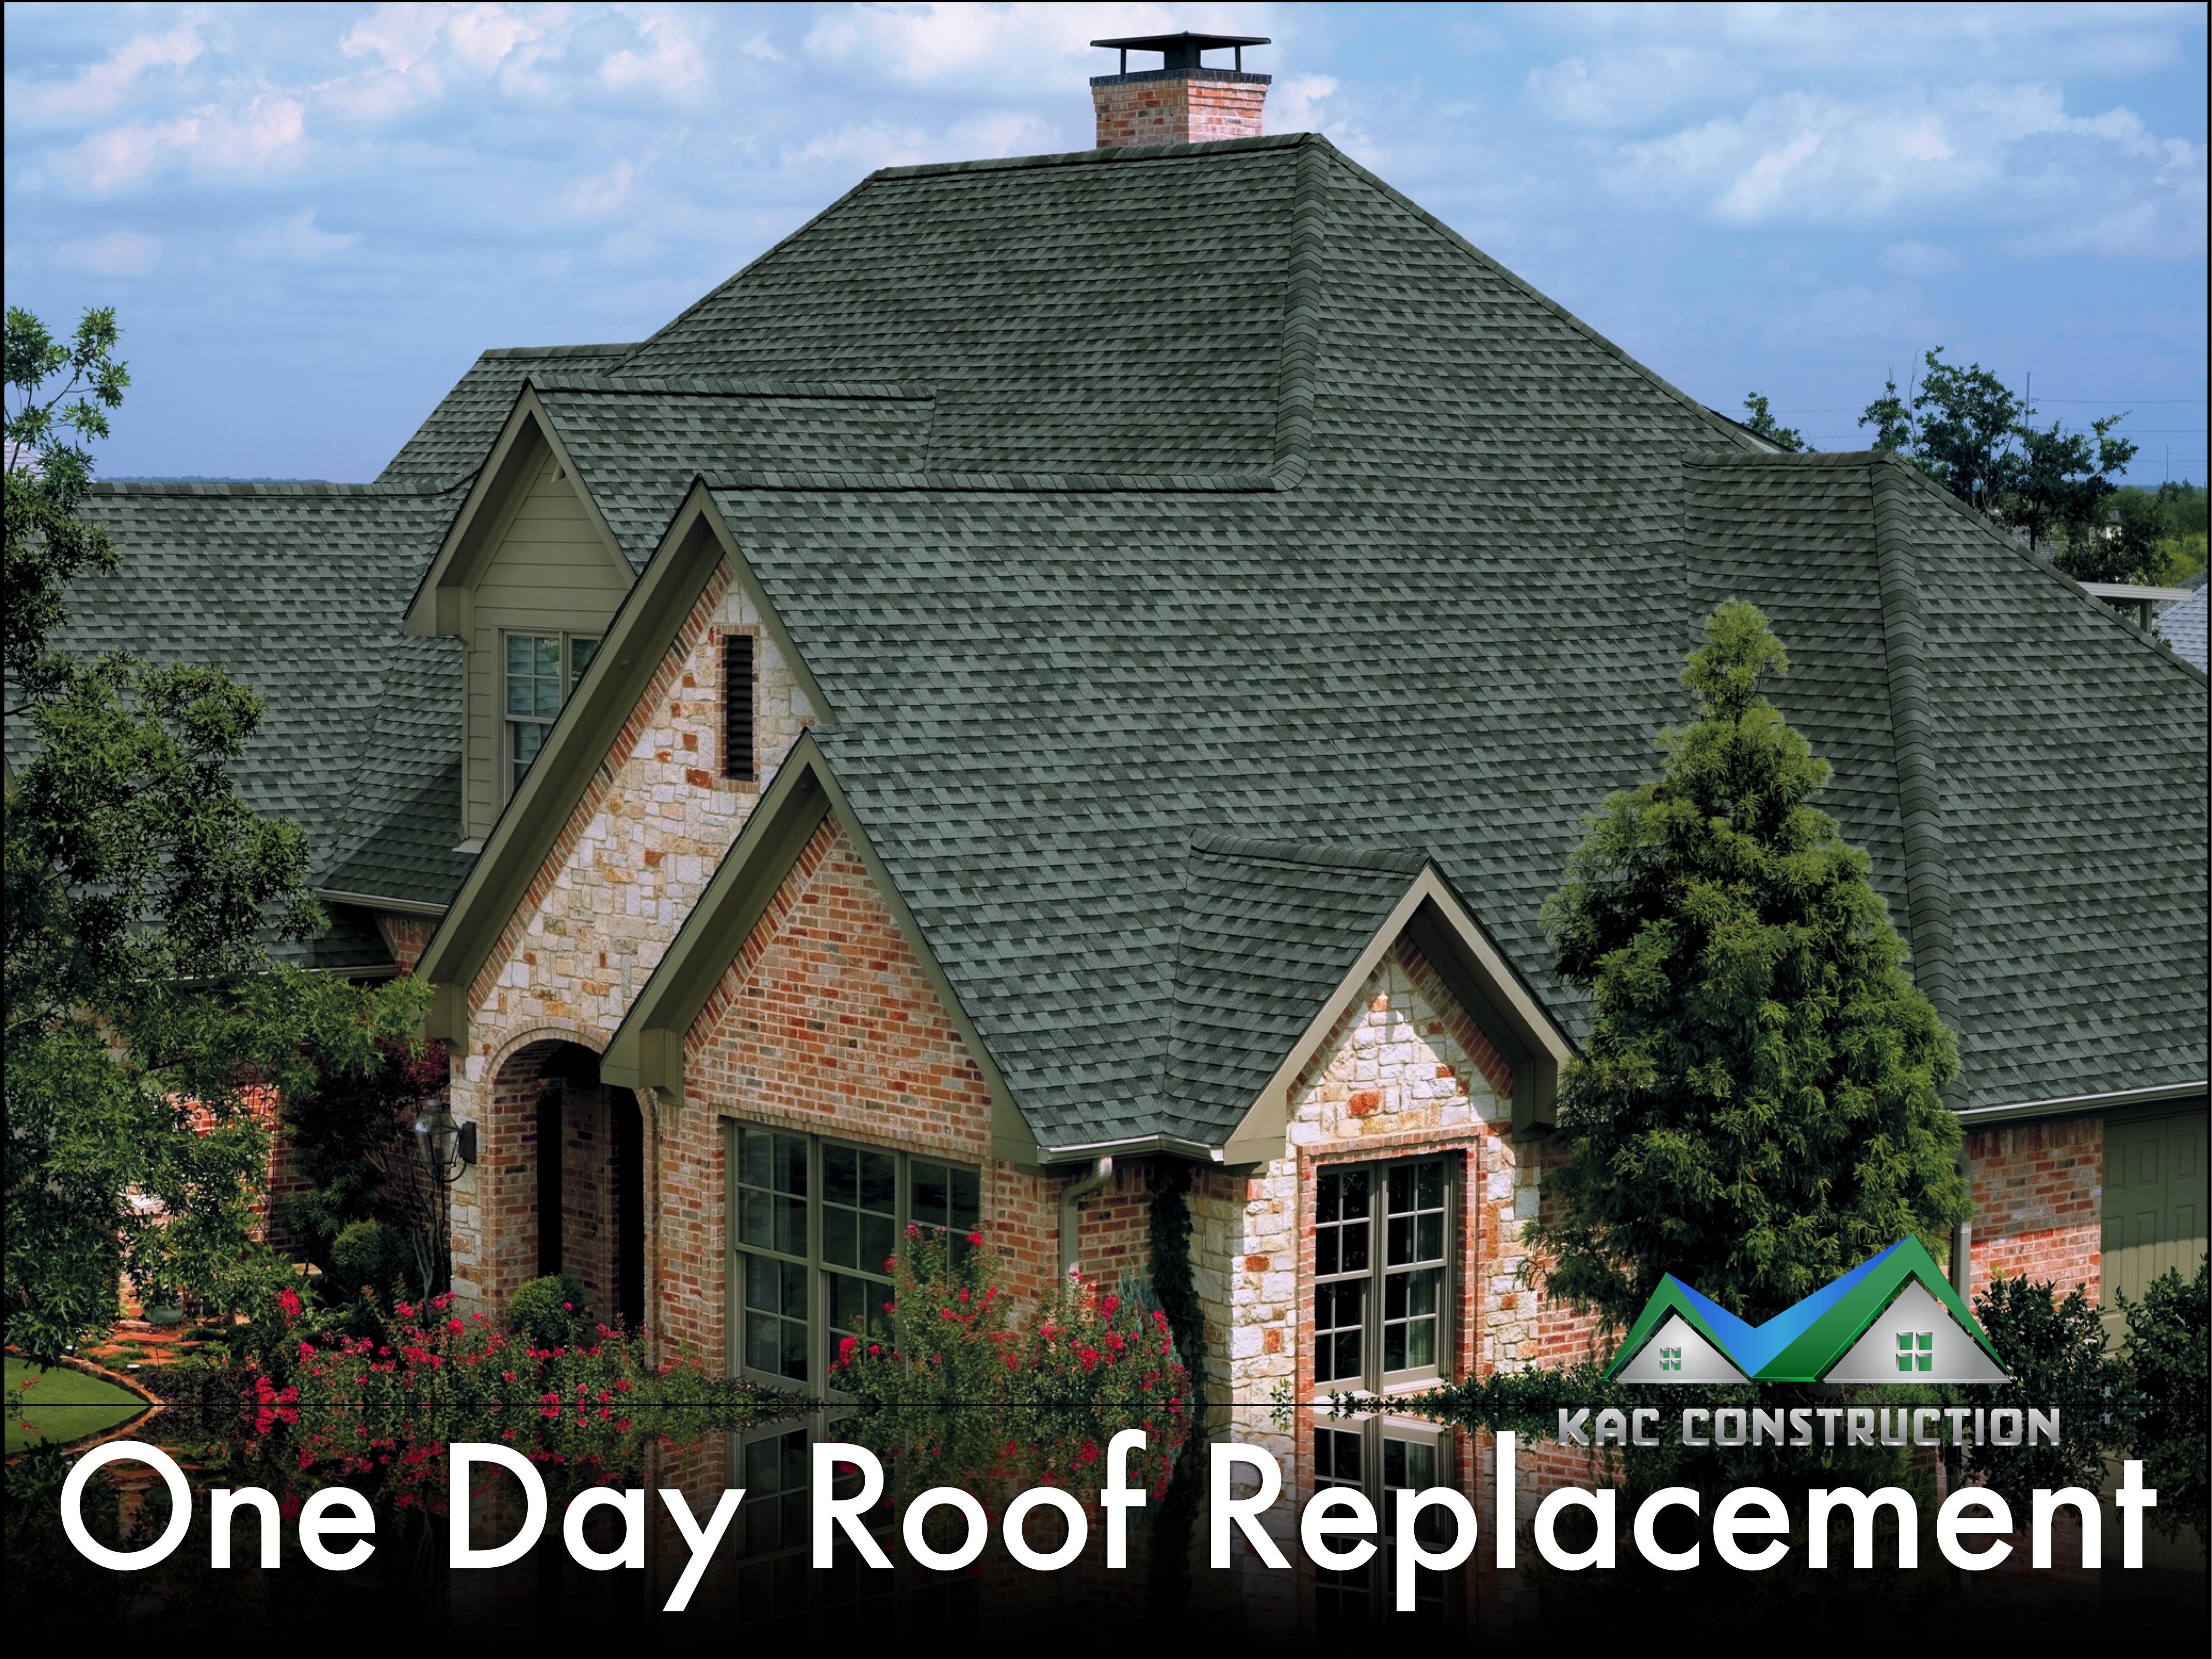 Roofing companies, roofing companies ri, roofing companies financing, roofing companies financing ri, roofing financing, roofing financing ri